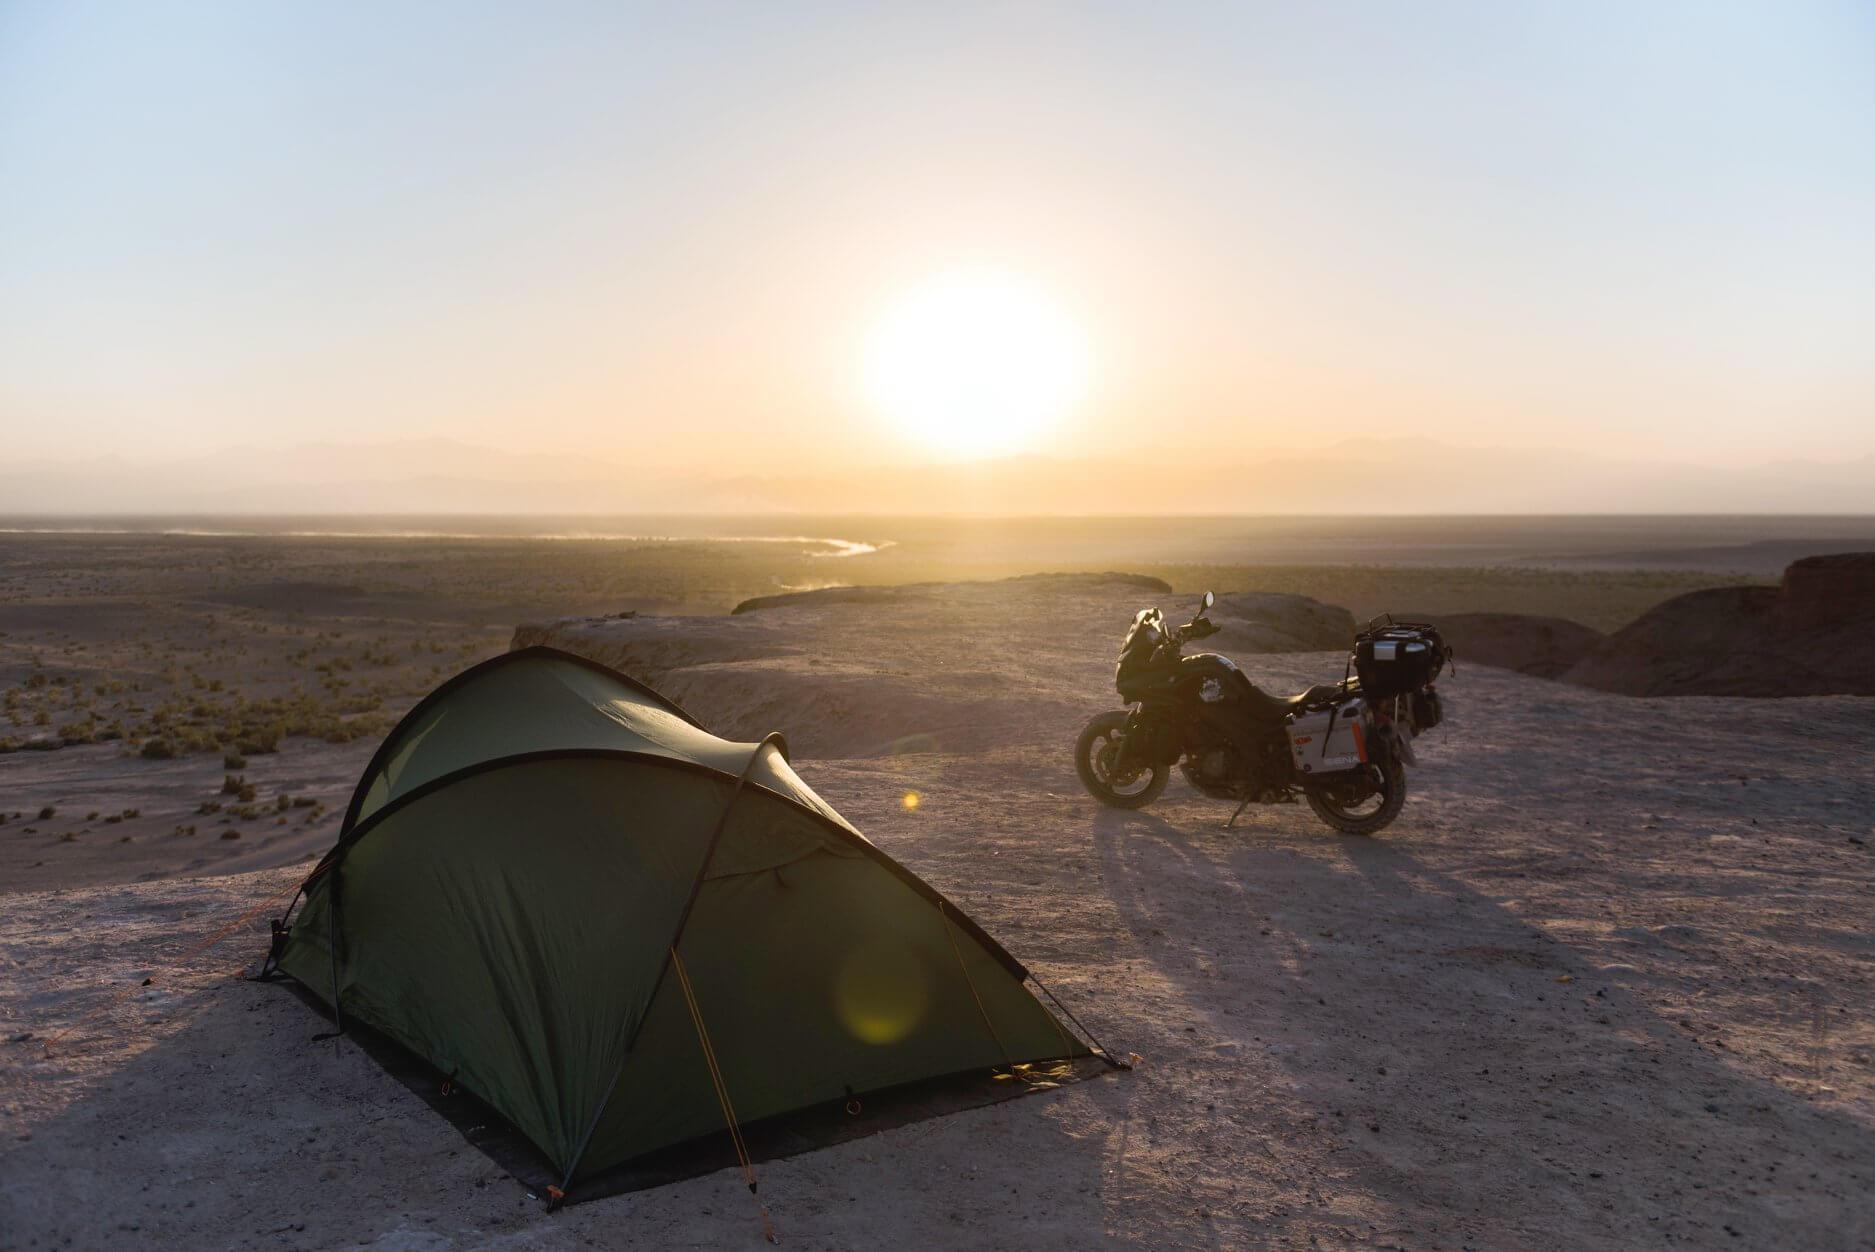 acampada - wildfeathers